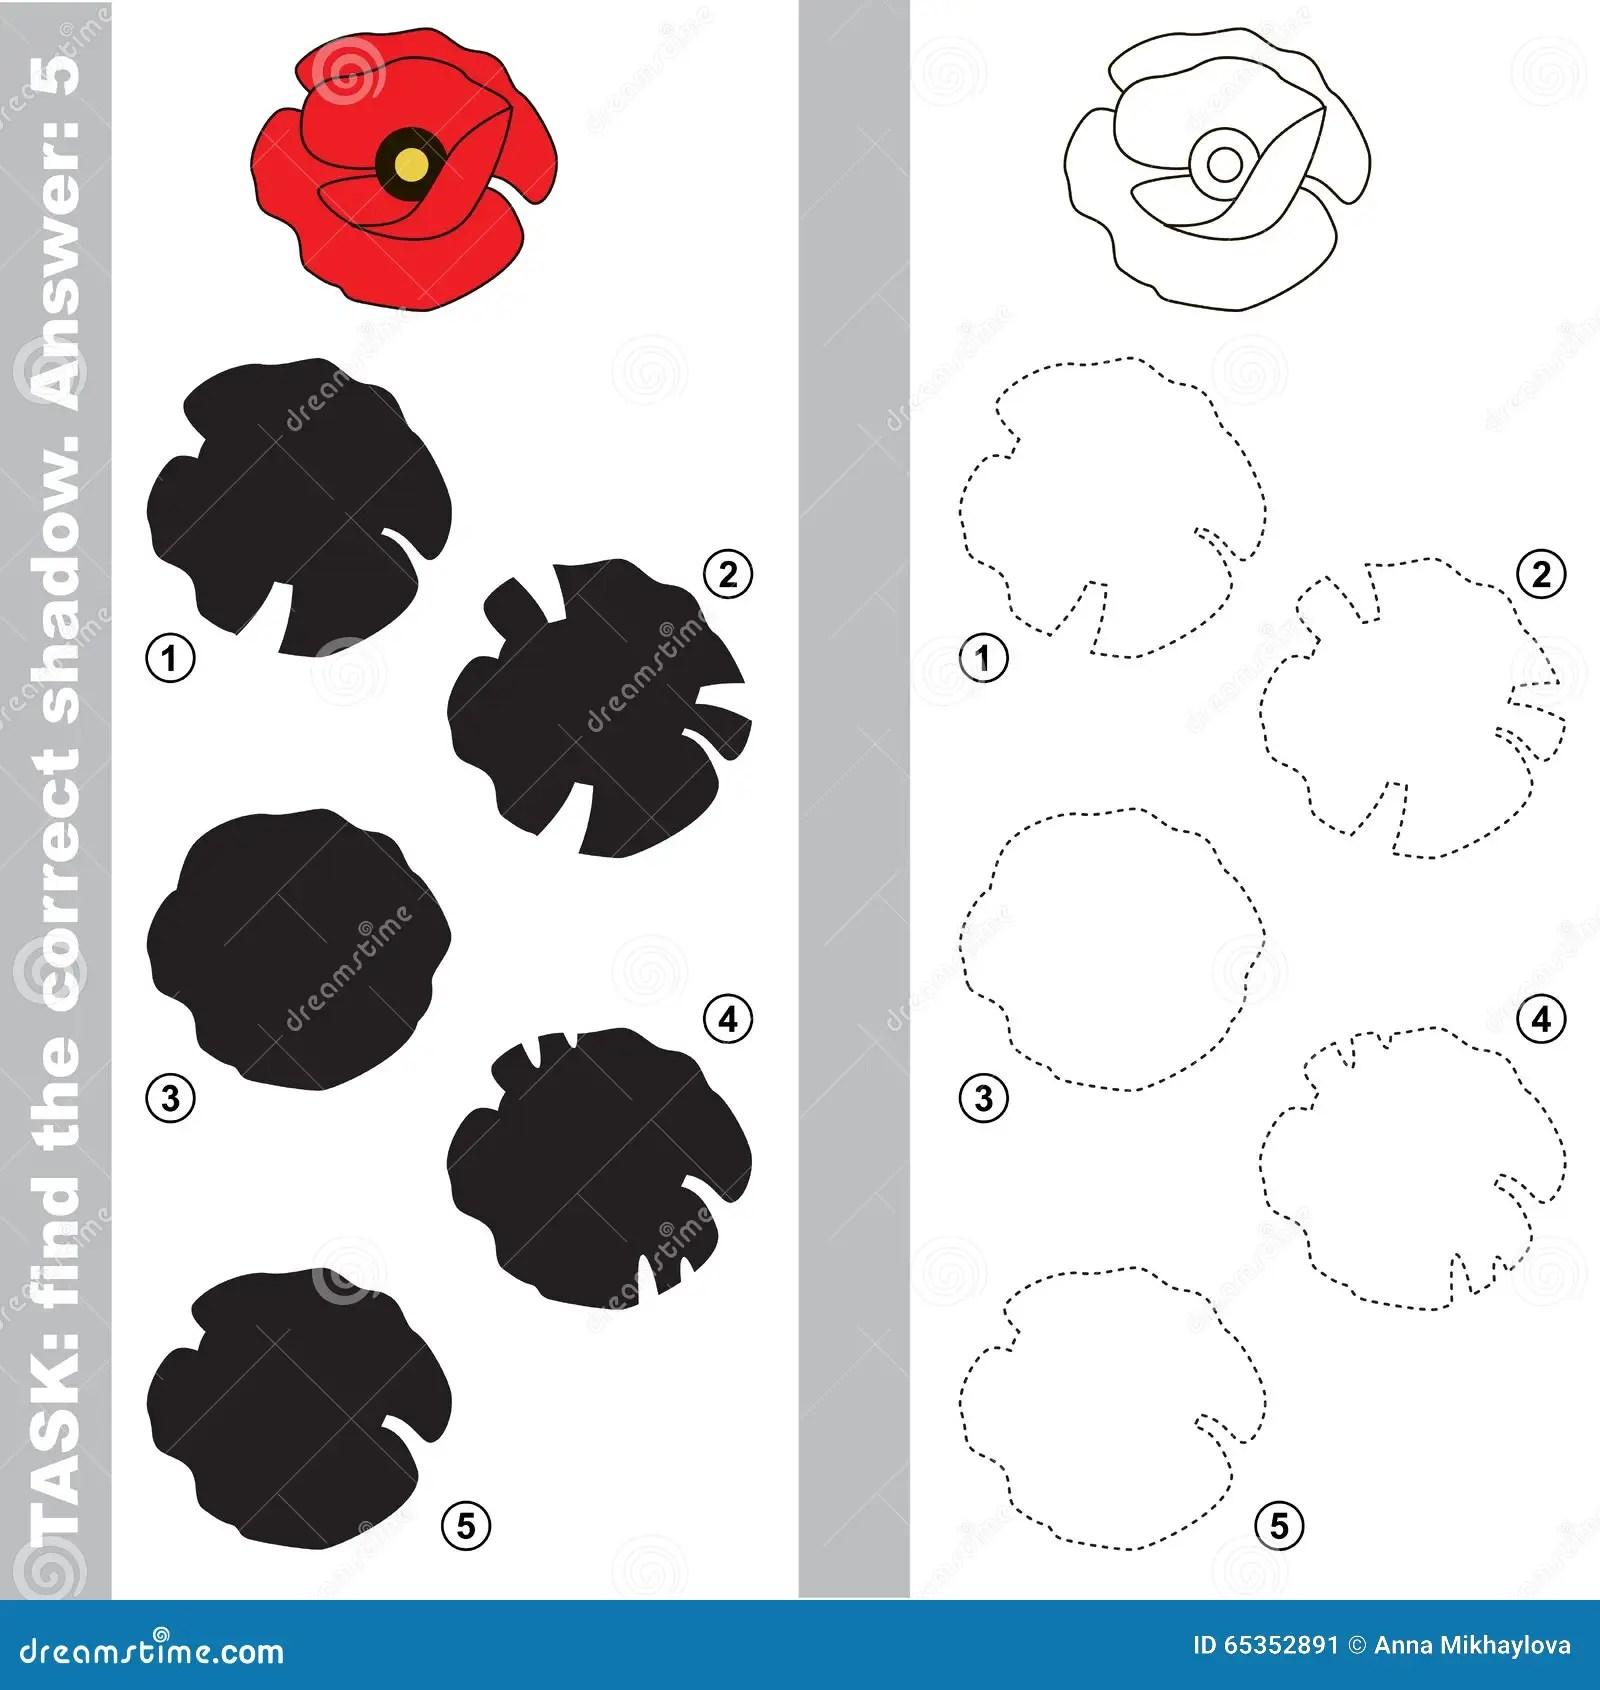 Find True Correct Shadow The Educational Kid Game Cartoon Vector